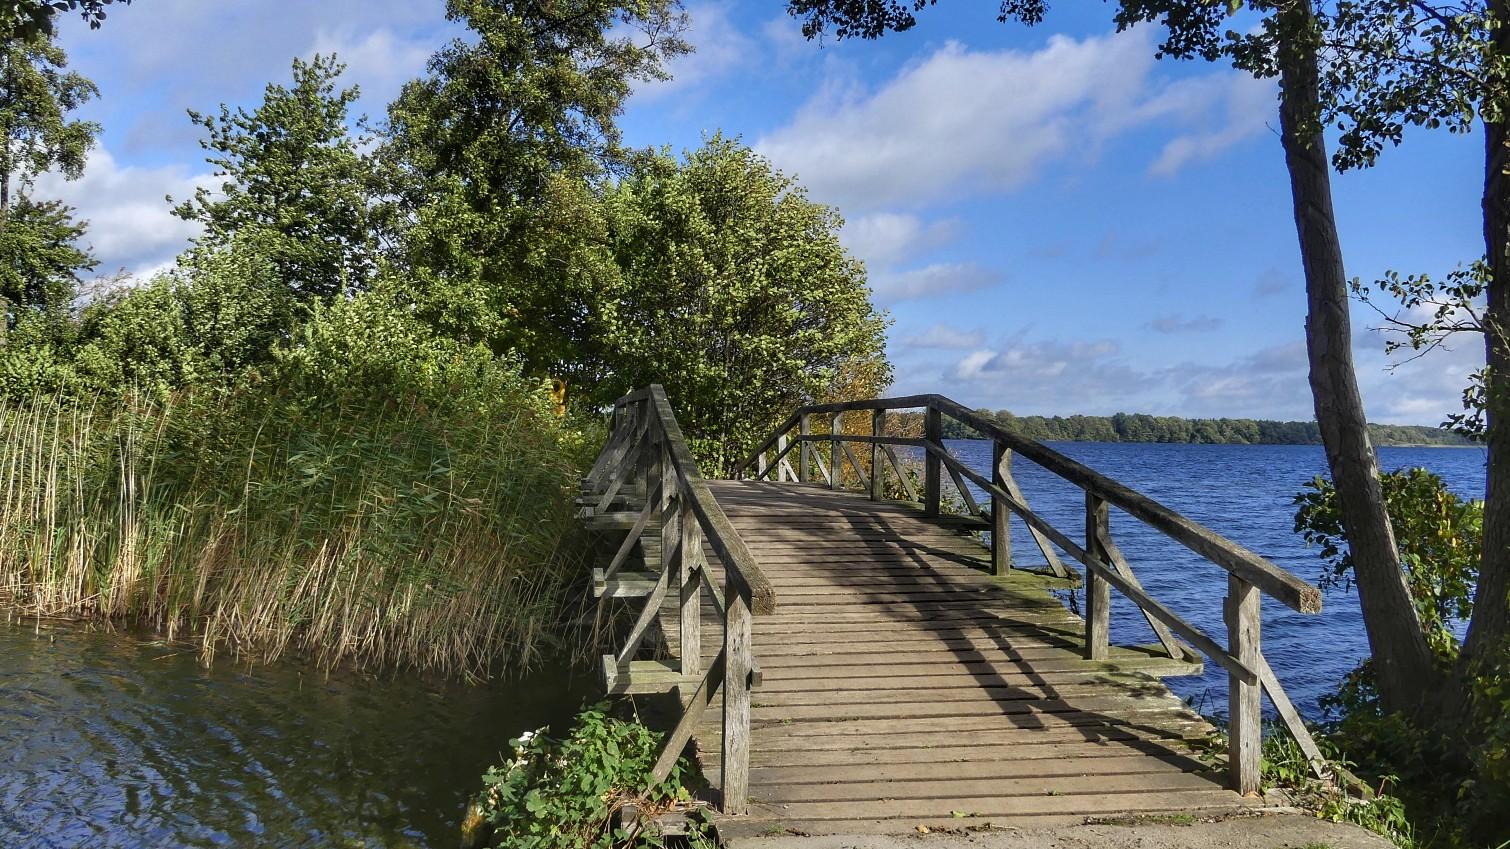 Zarrentin, Kirchensee, Biosphärenreservat